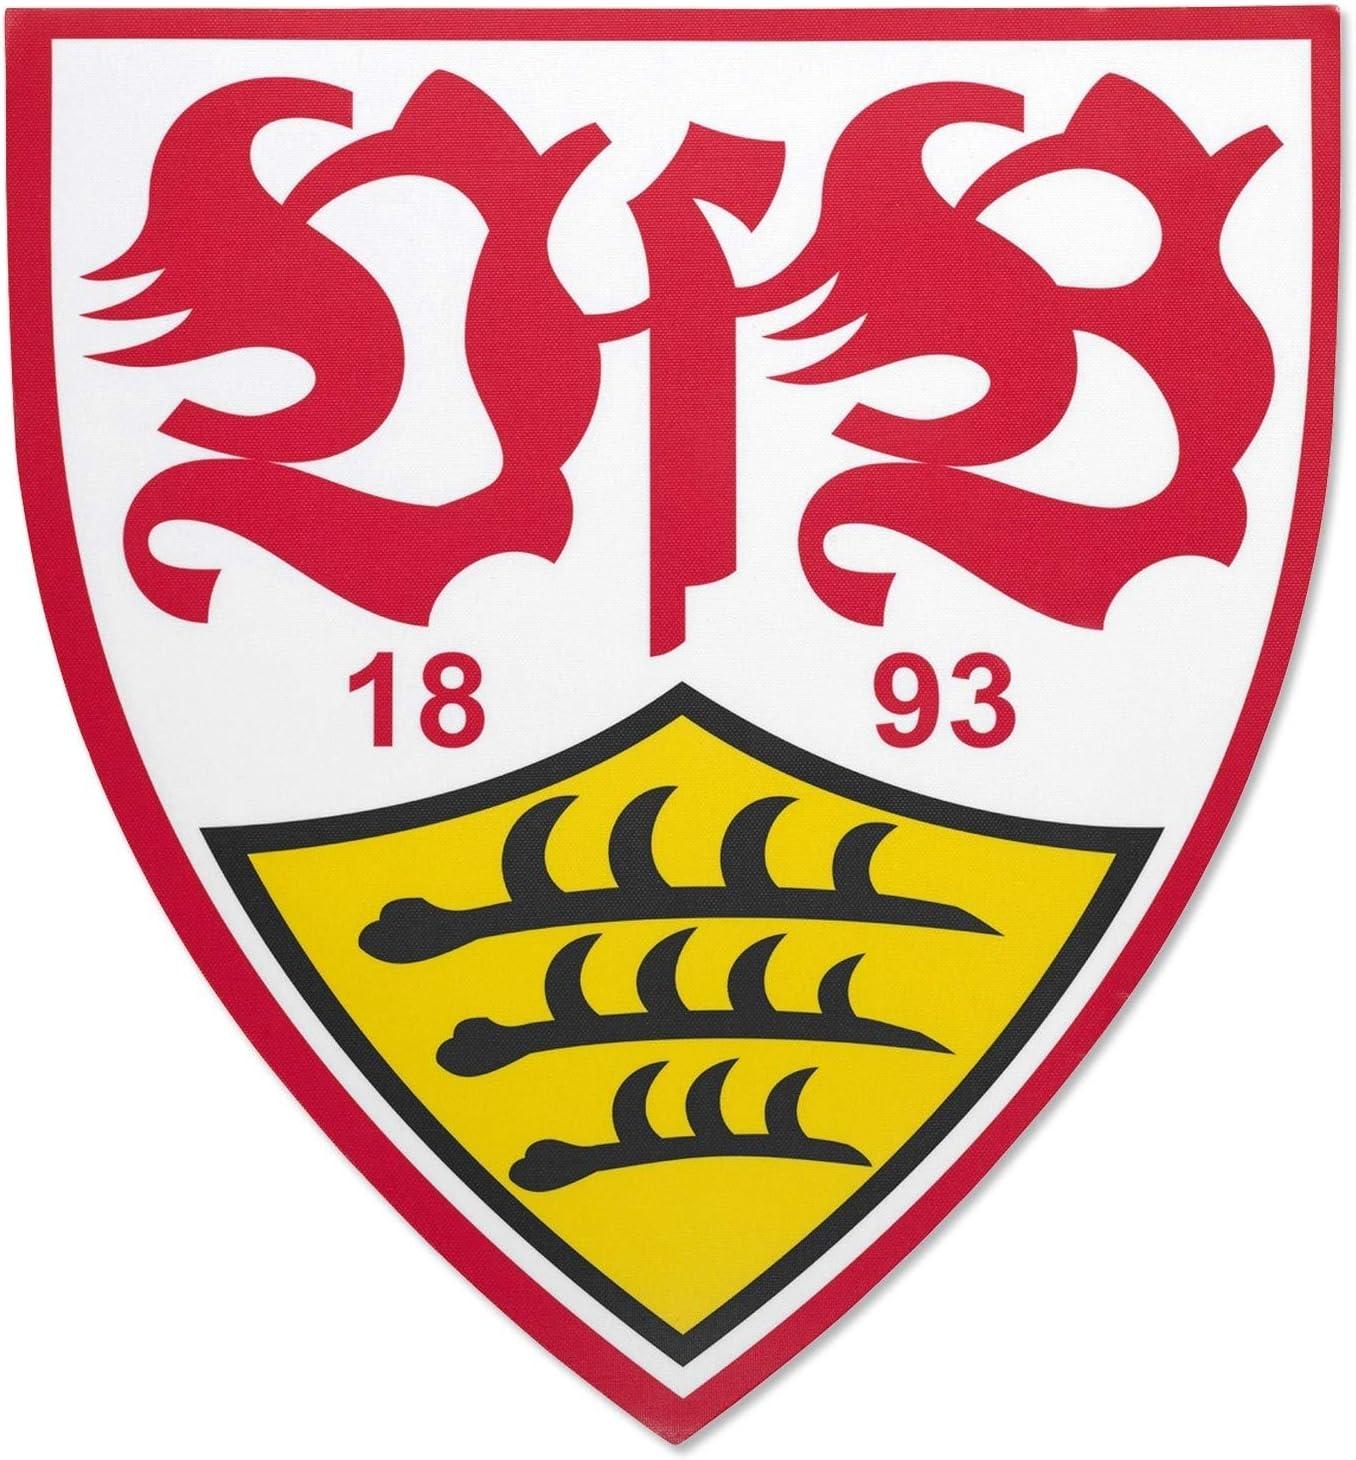 Plus Lesezeichen Wir lieben Fu/ßball Kaffeetasse Mug Relief Schriftzug VfB Stuttgart Tasse